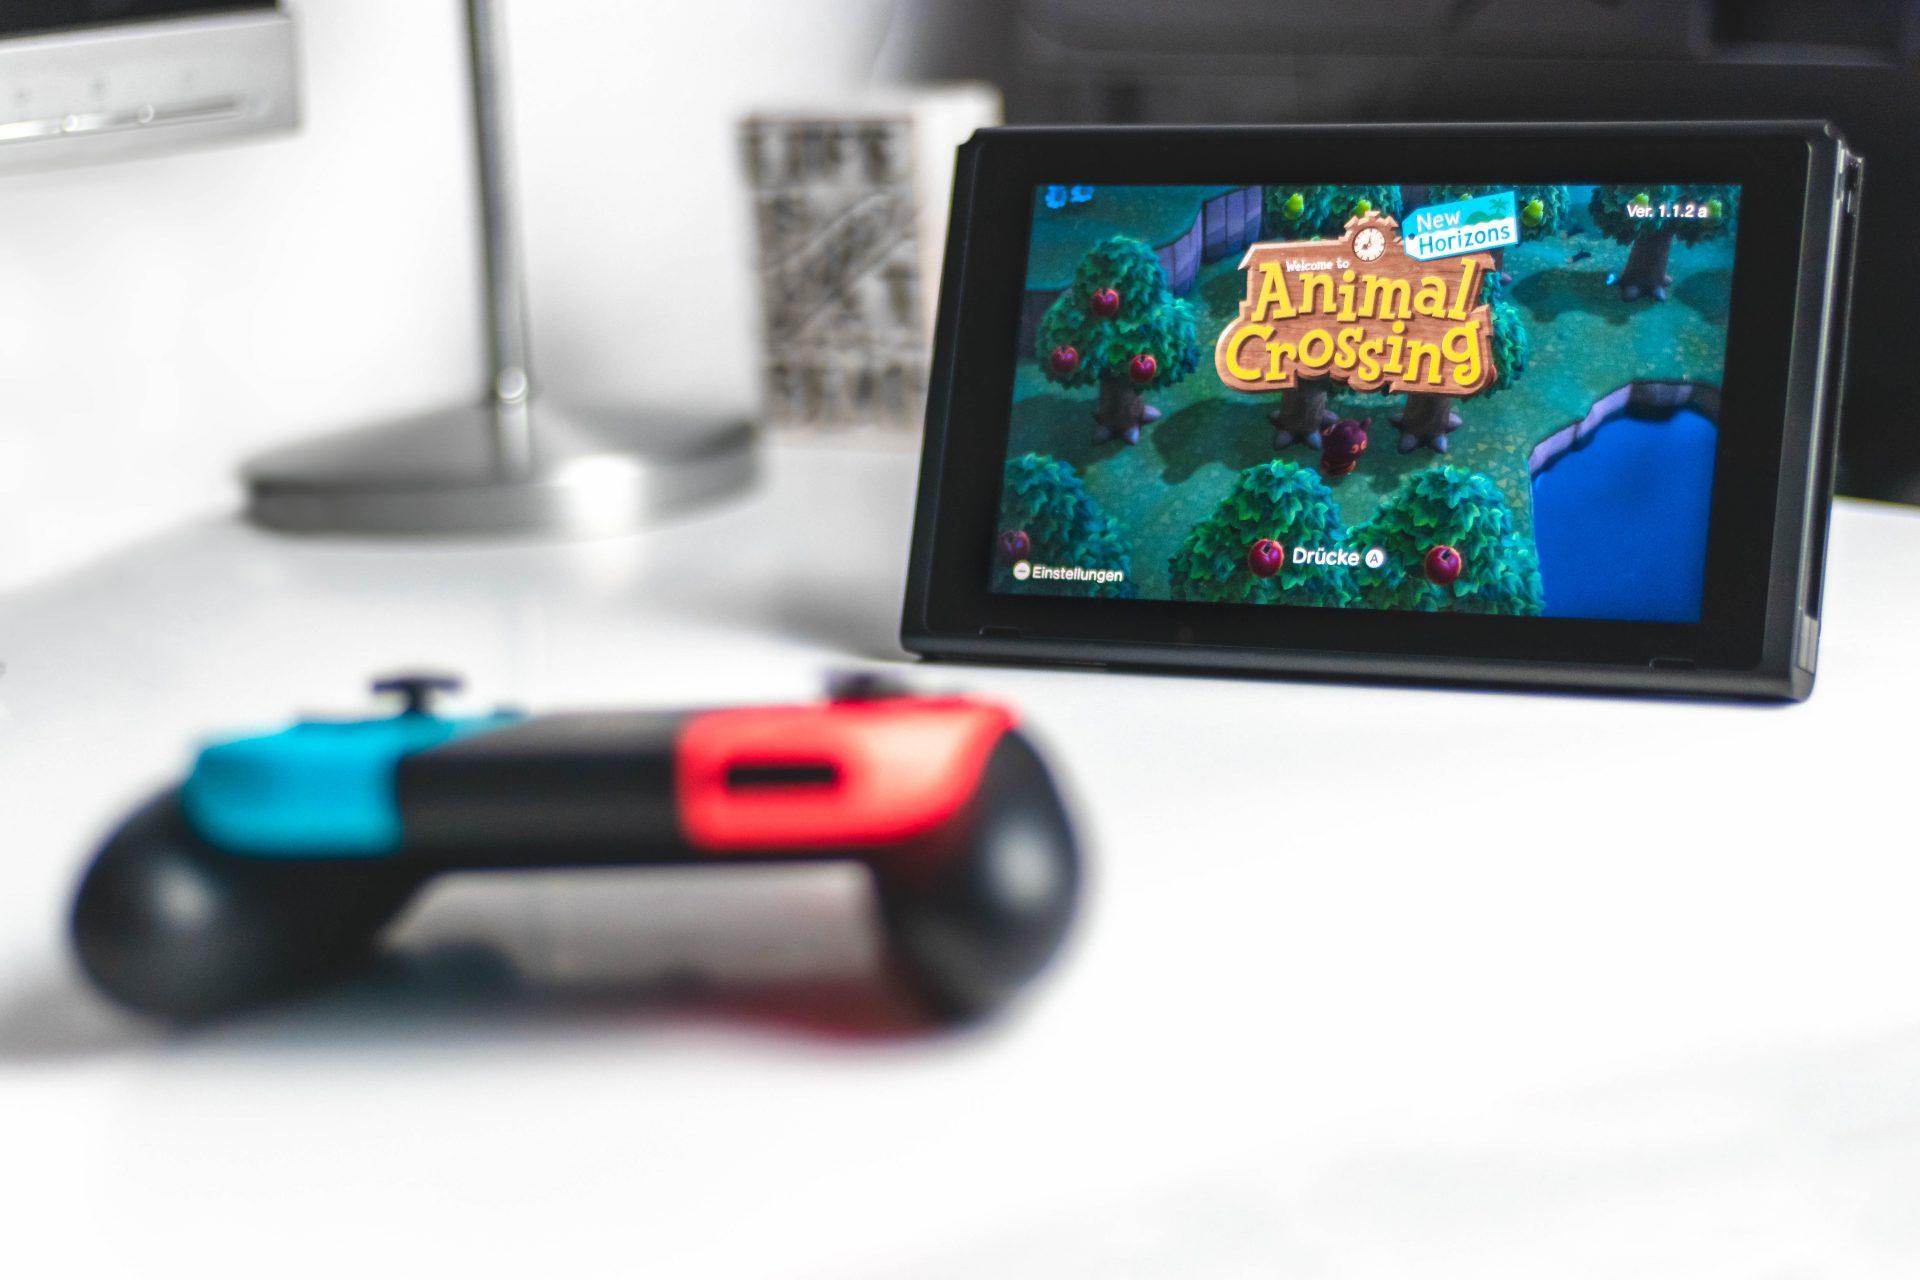 Nintendo Switch Black Friday Animal Crossings